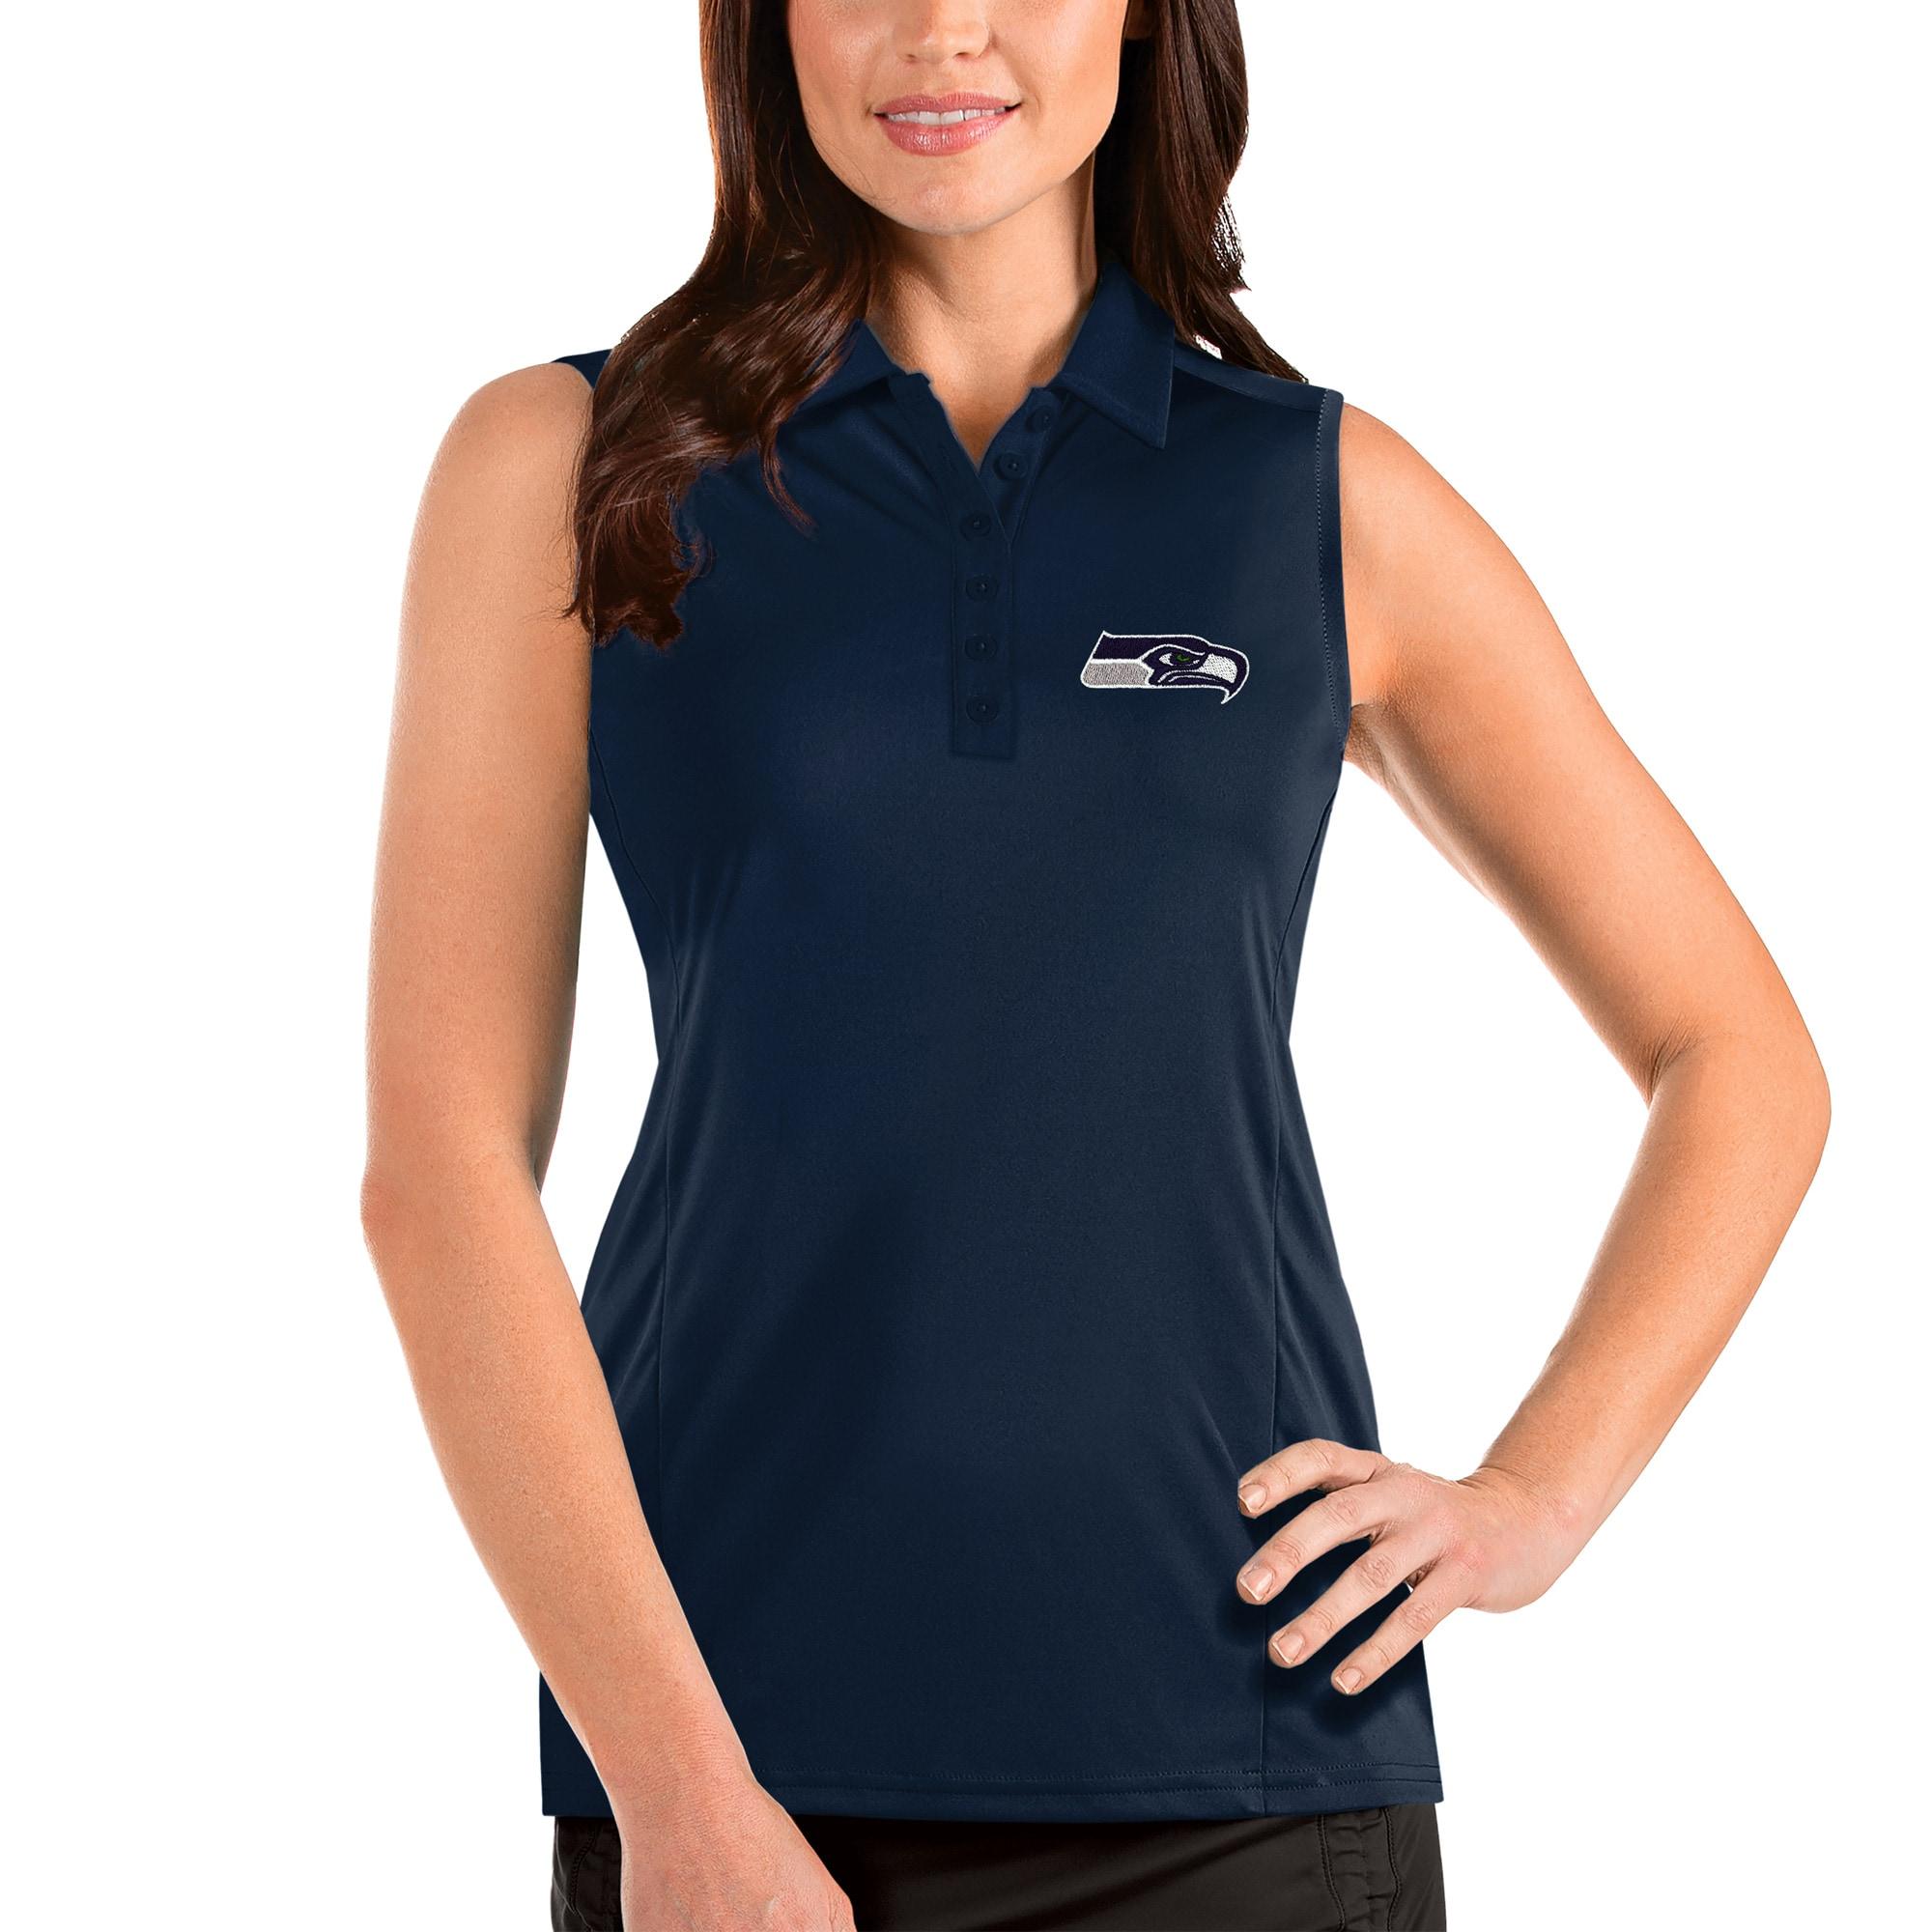 Seattle Seahawks Antigua Women's Sleeveless Tribute Polo - Navy